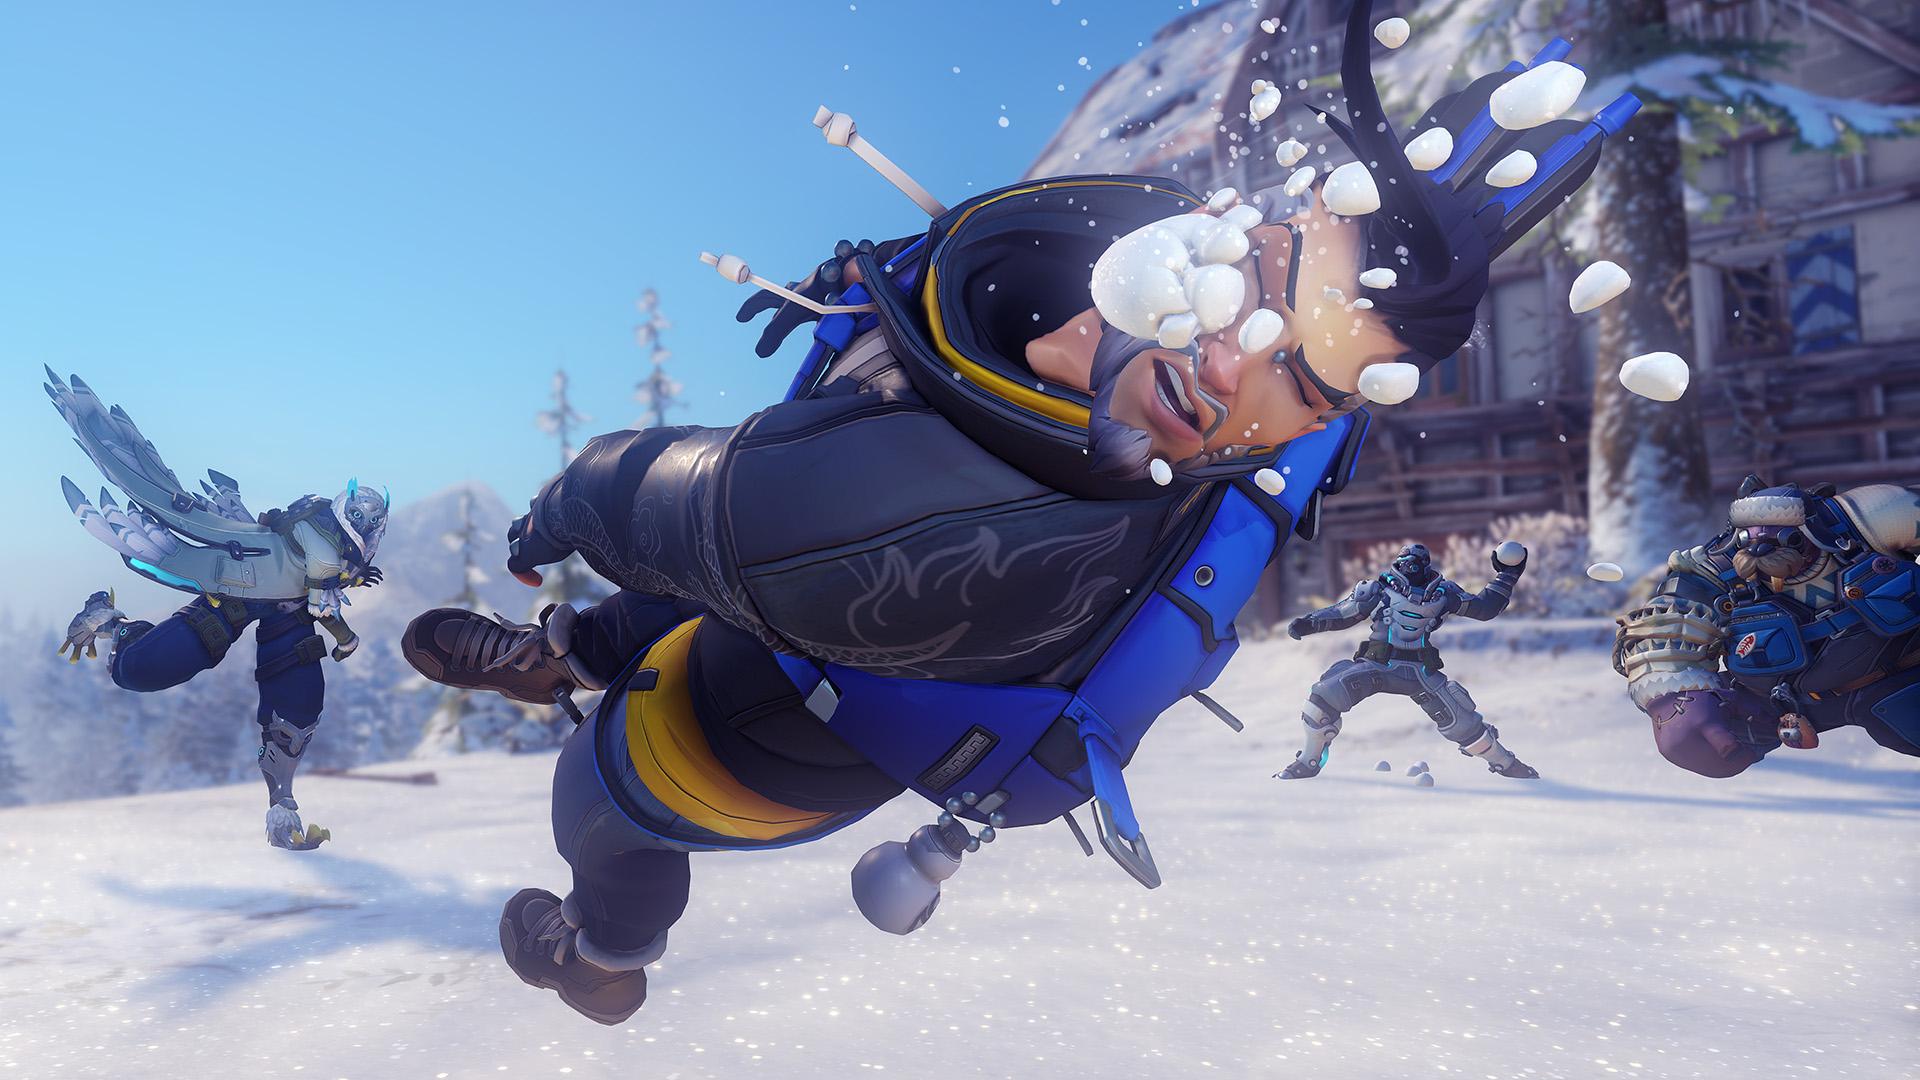 Overwatch Winter Wonderland skins revealed | PC Gamer